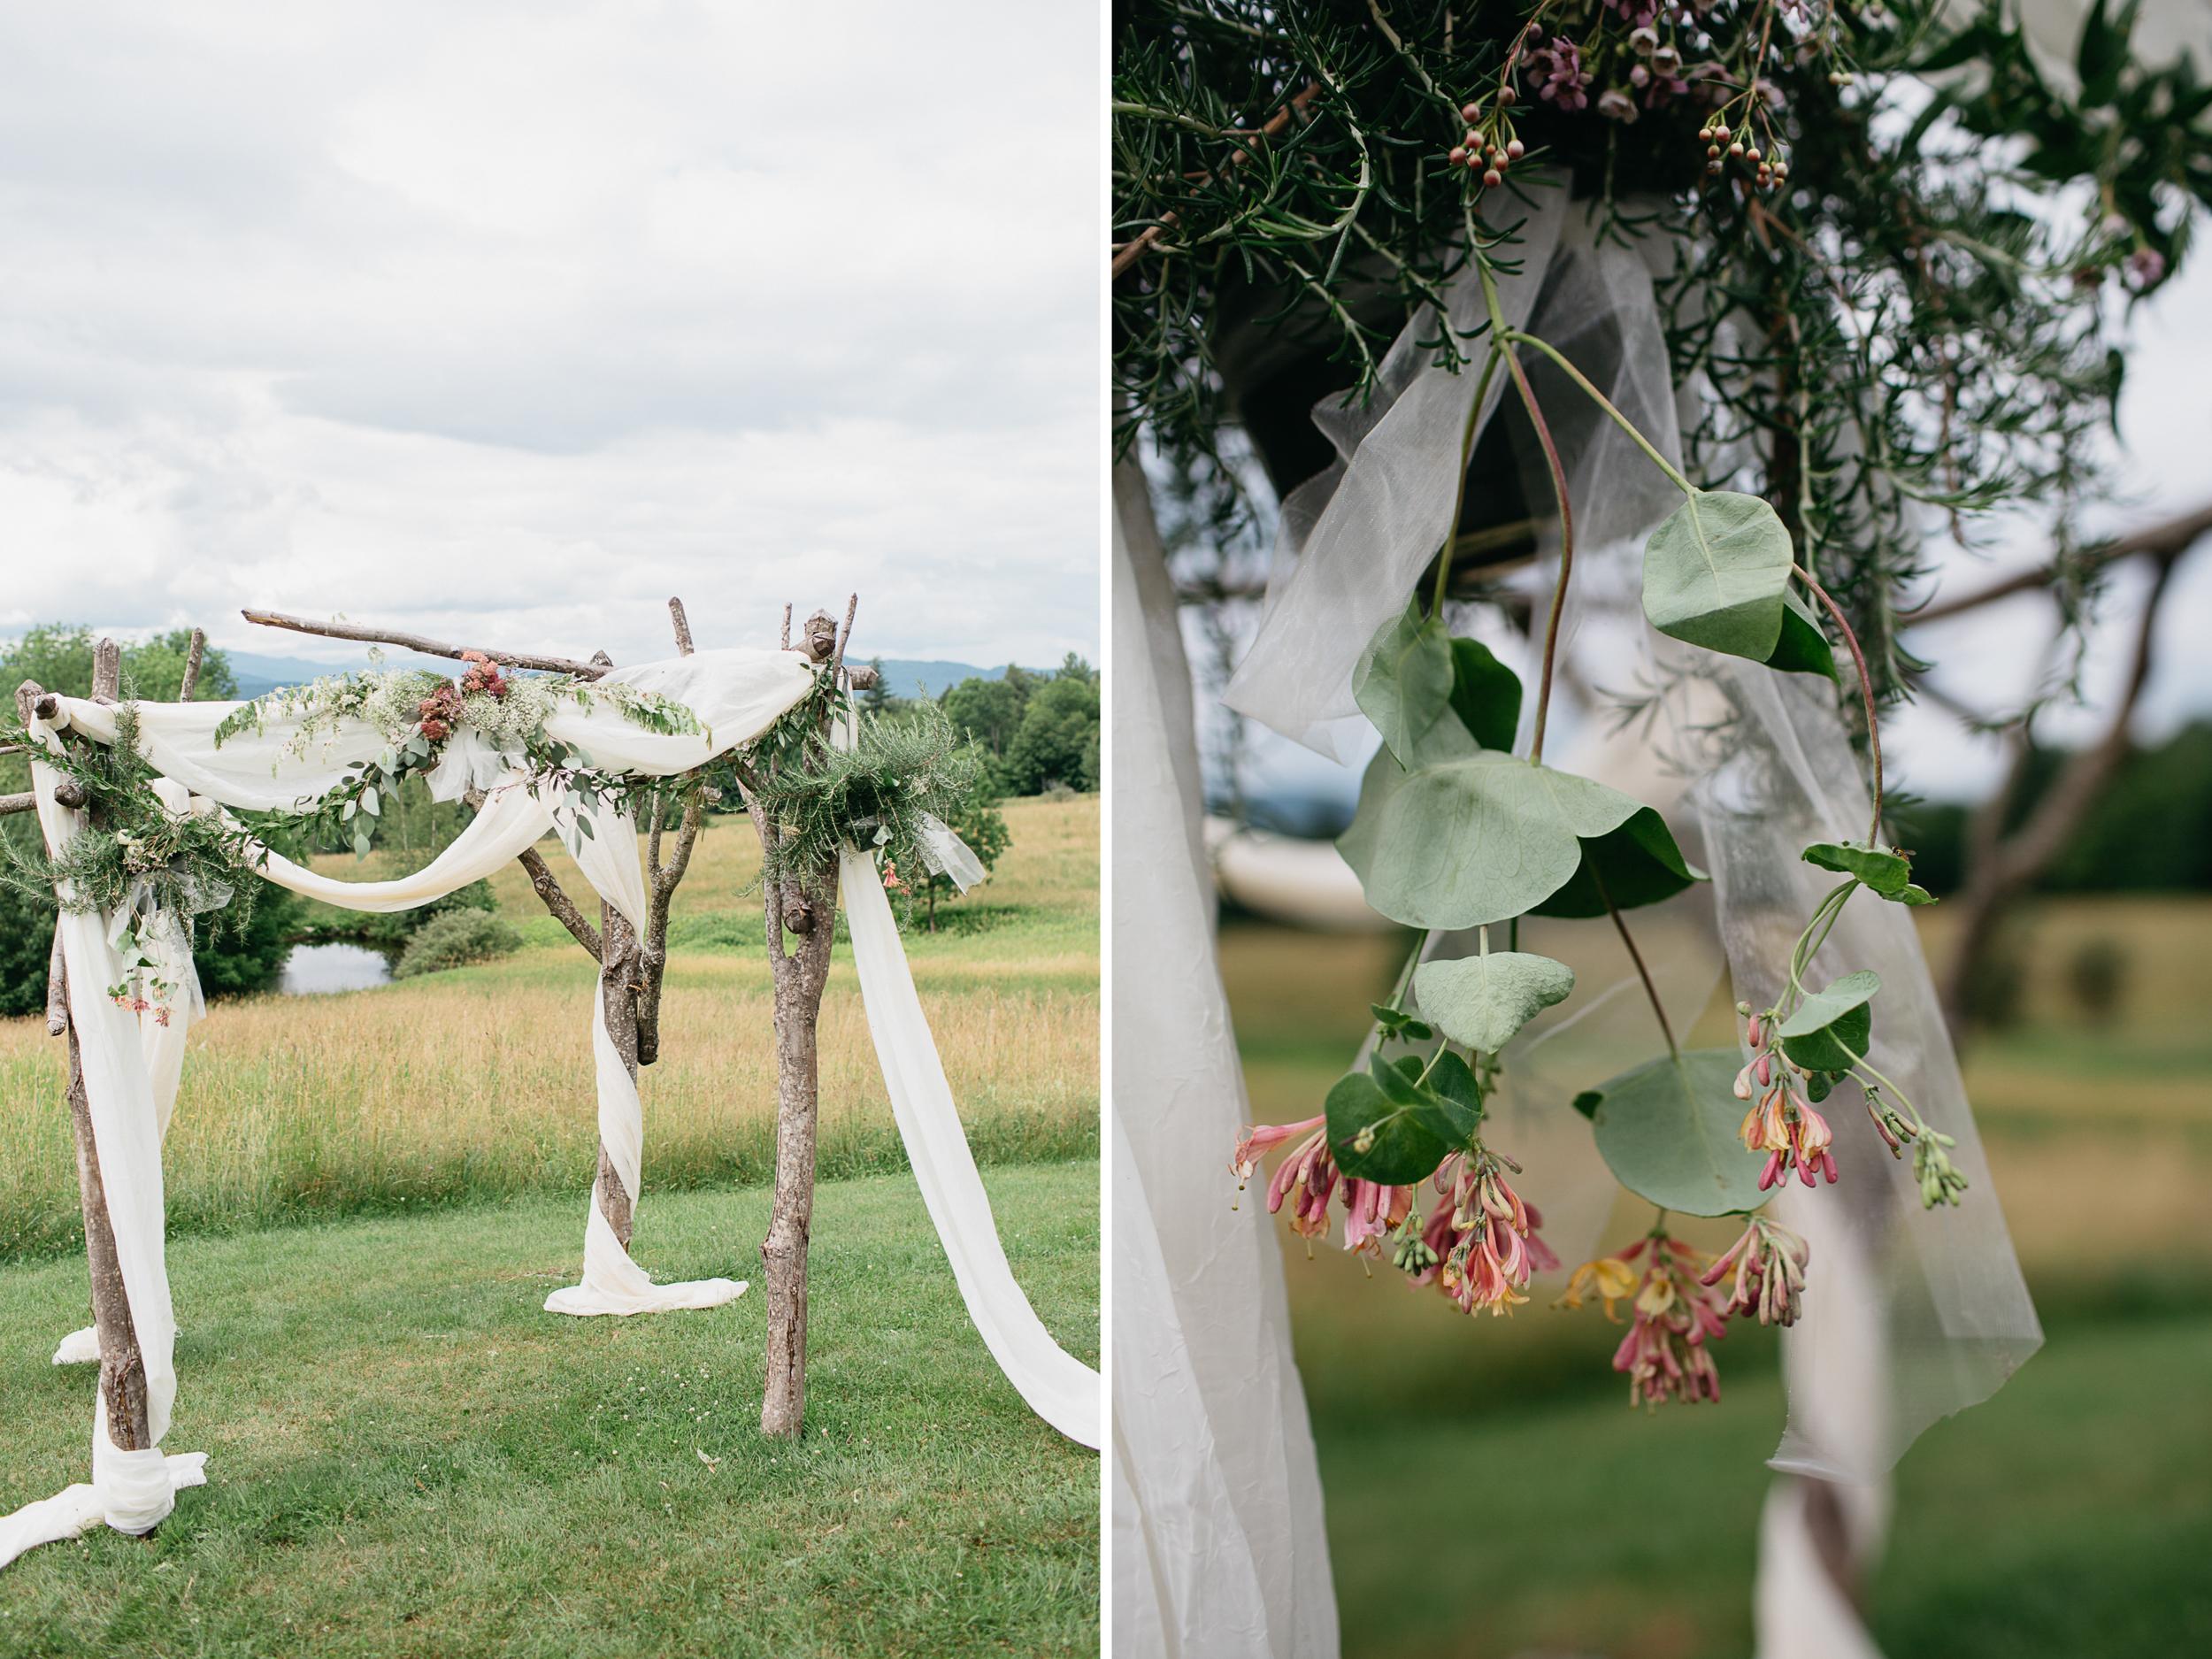 Karen_Alex_Bliss_ridge_farm_Vermont_wedding010.jpg